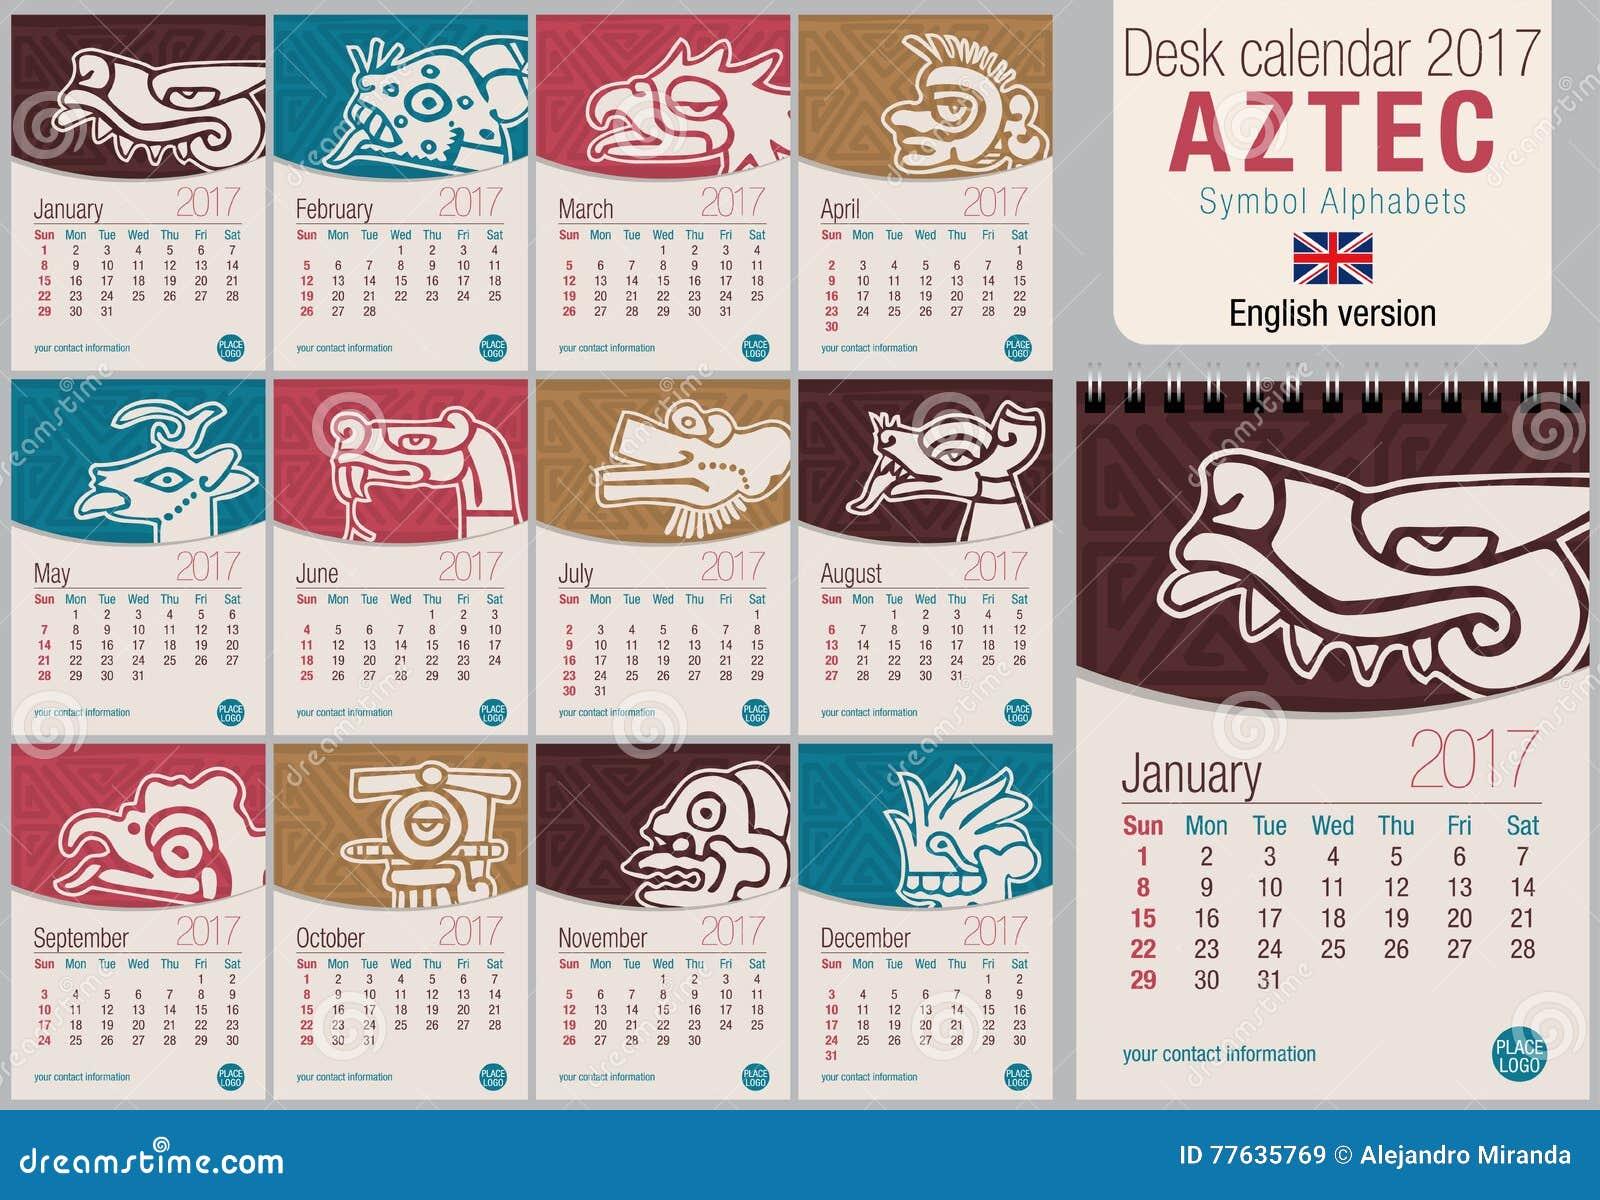 Table Calendar Size : Desk triangle calendar template with aztec symbols